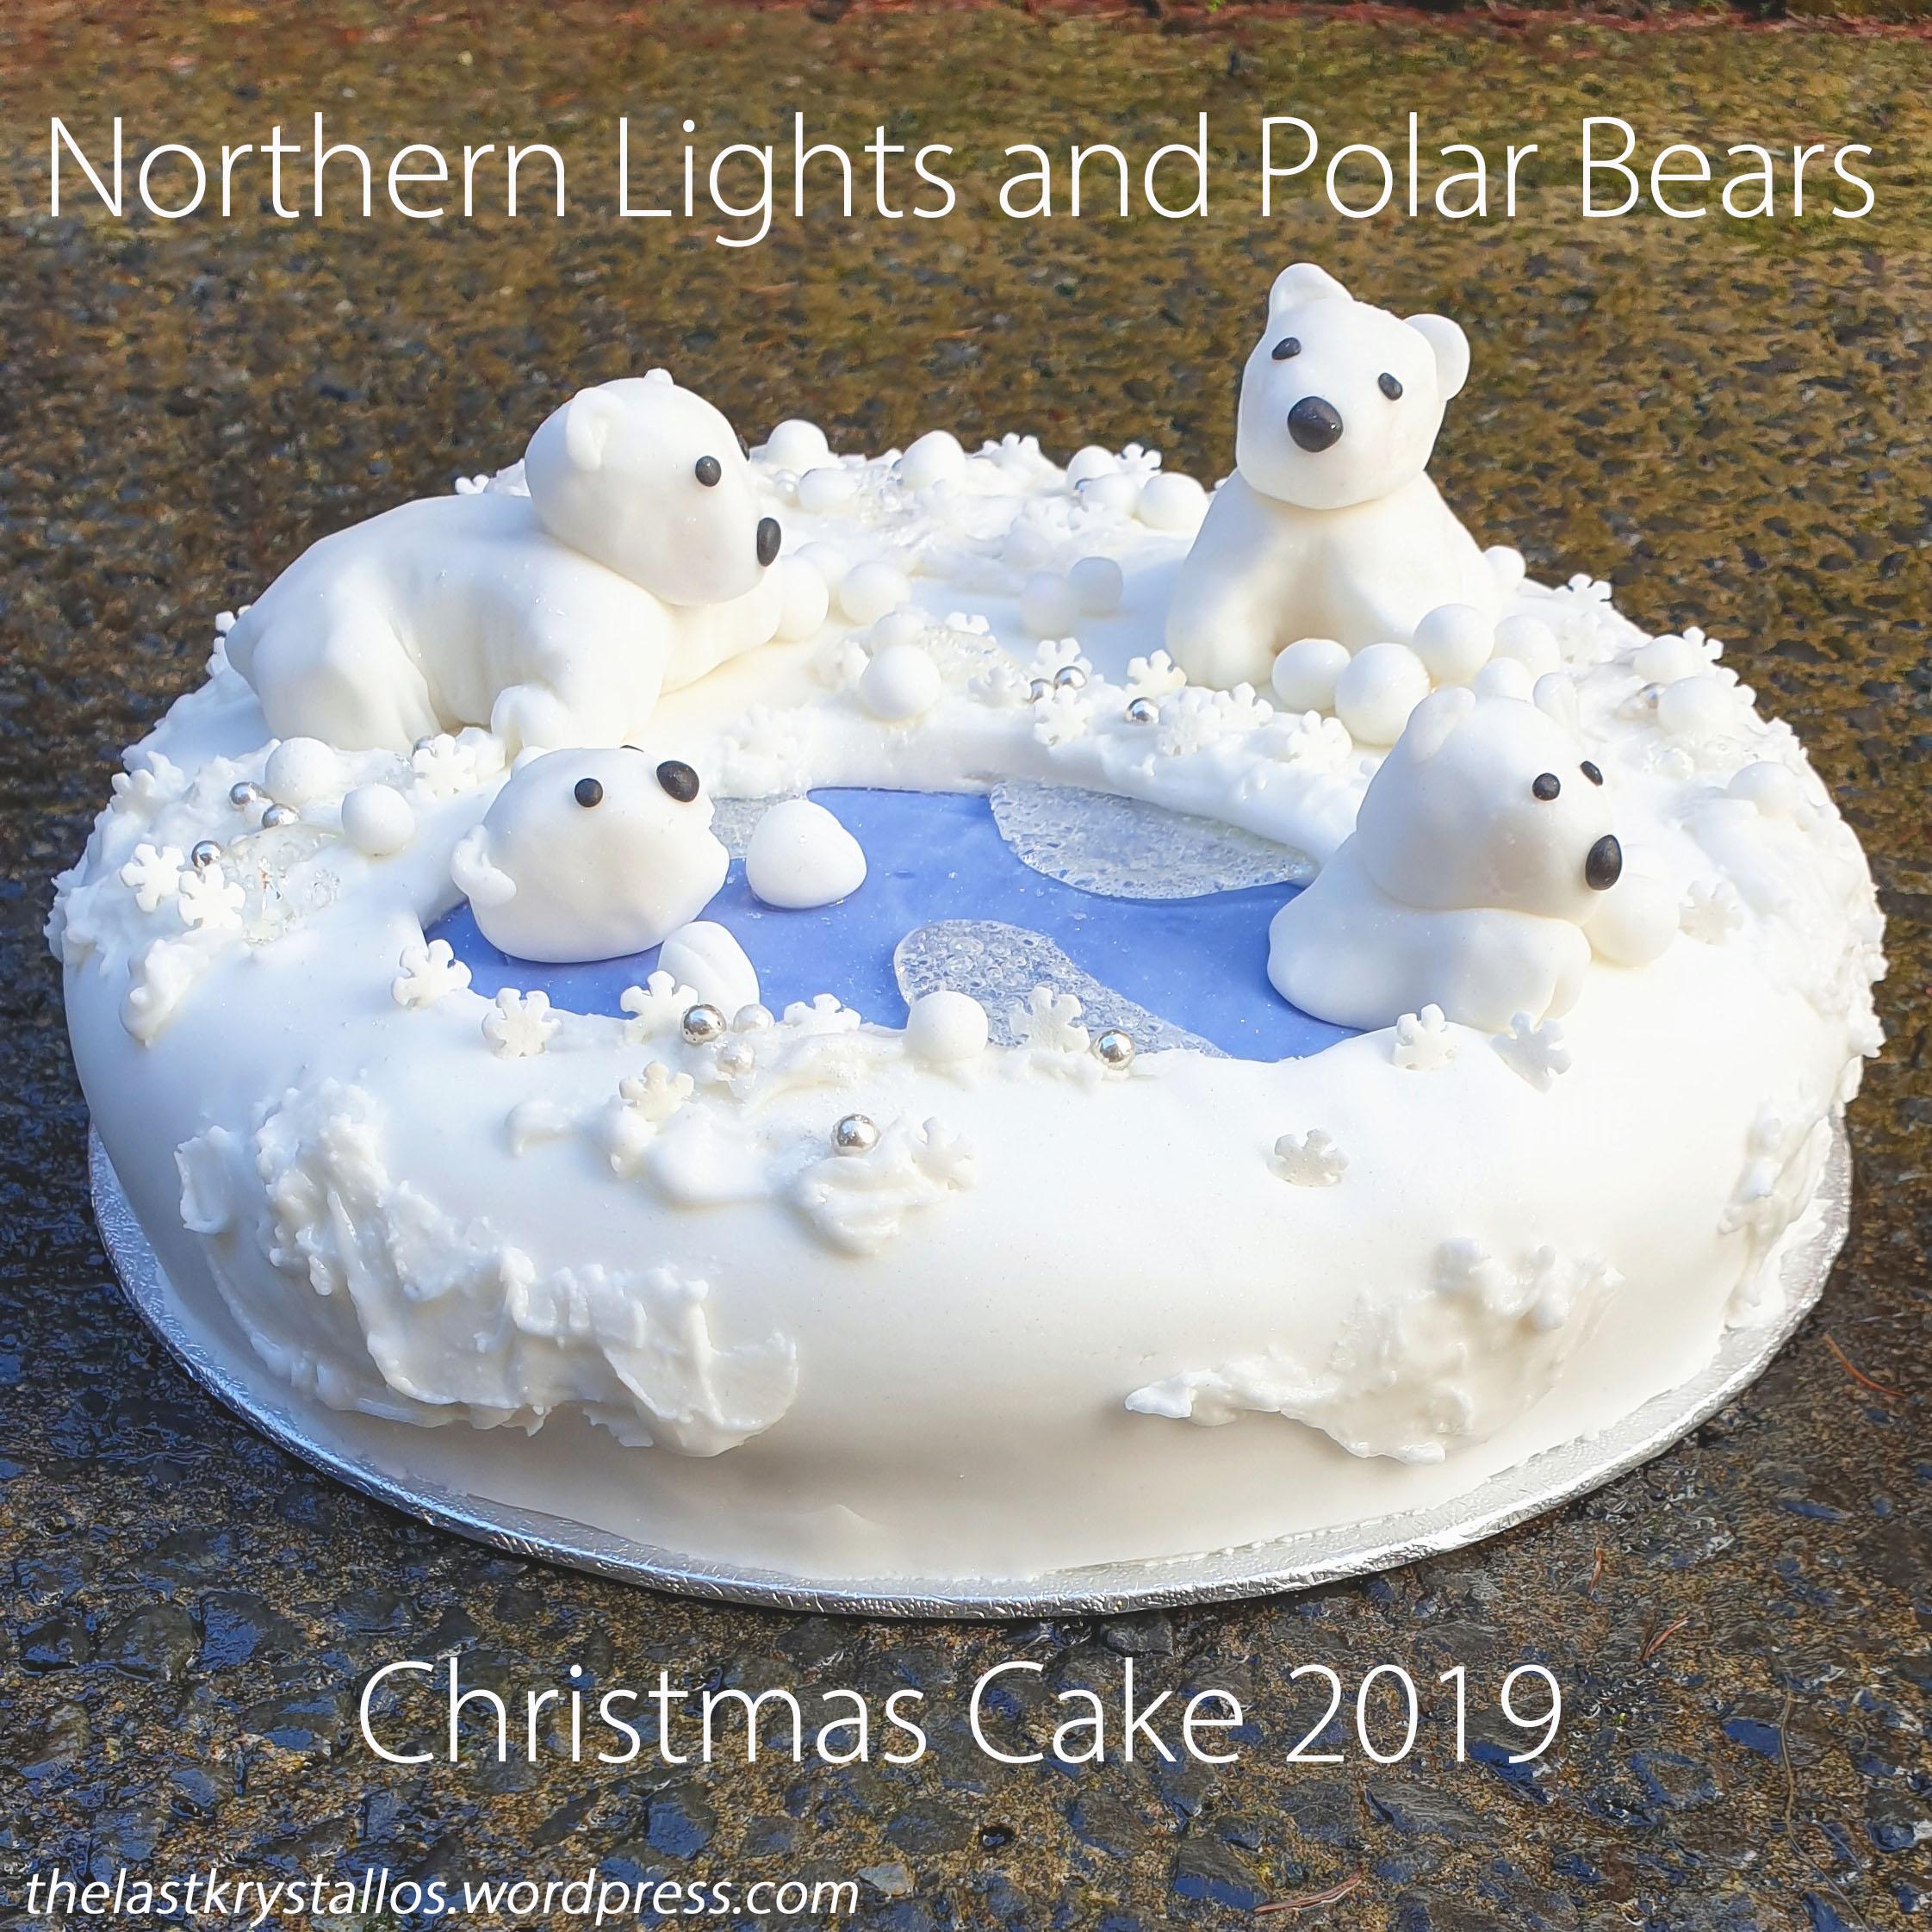 Northern Lights and Polar Bears Christmas Cake 2019 - The Last Krystallsos